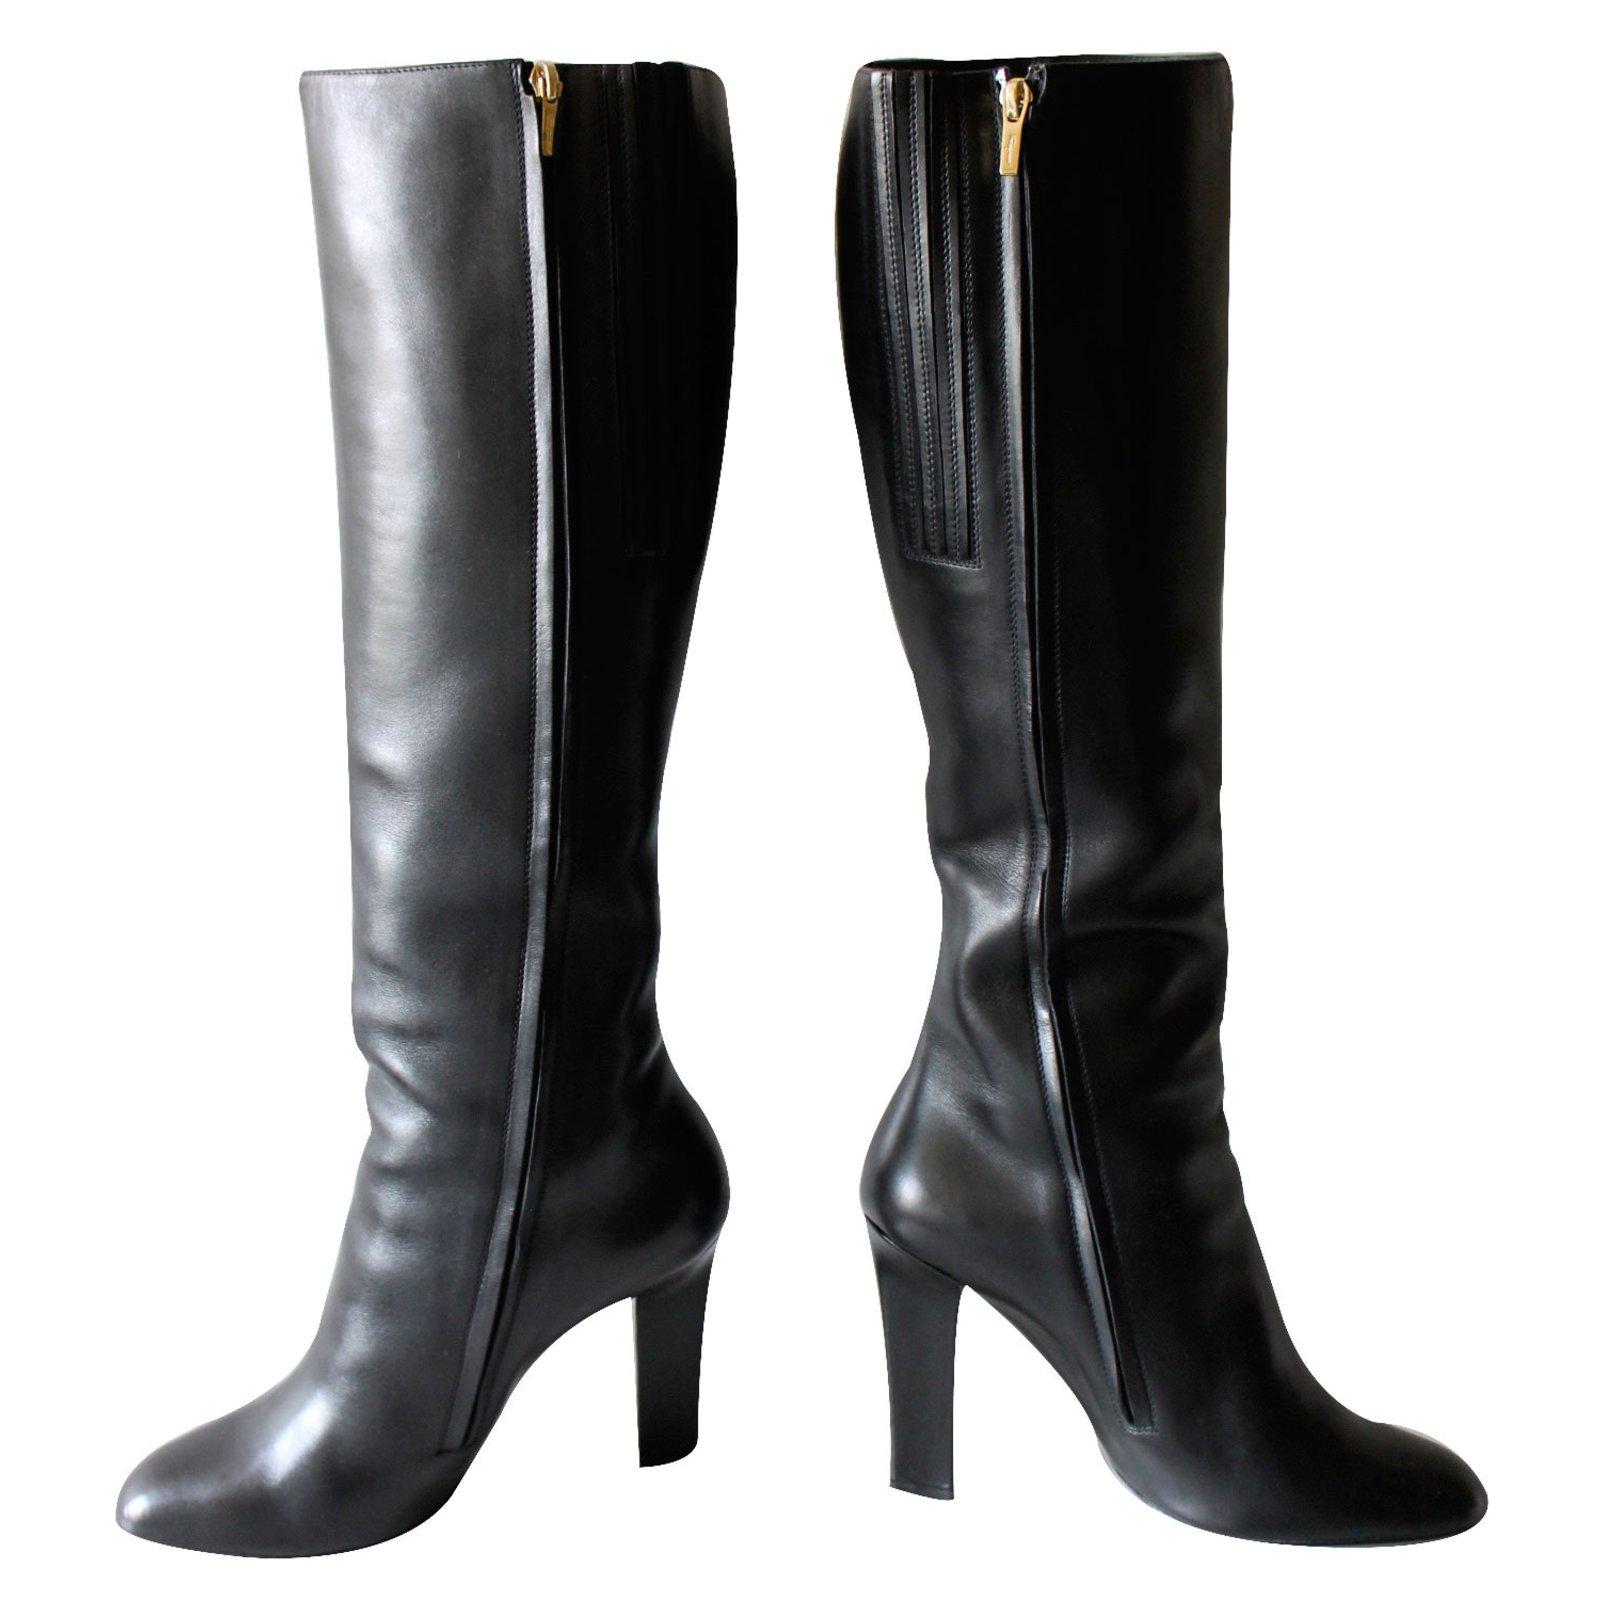 Salvatore Ferragamo Boots Boots Leather